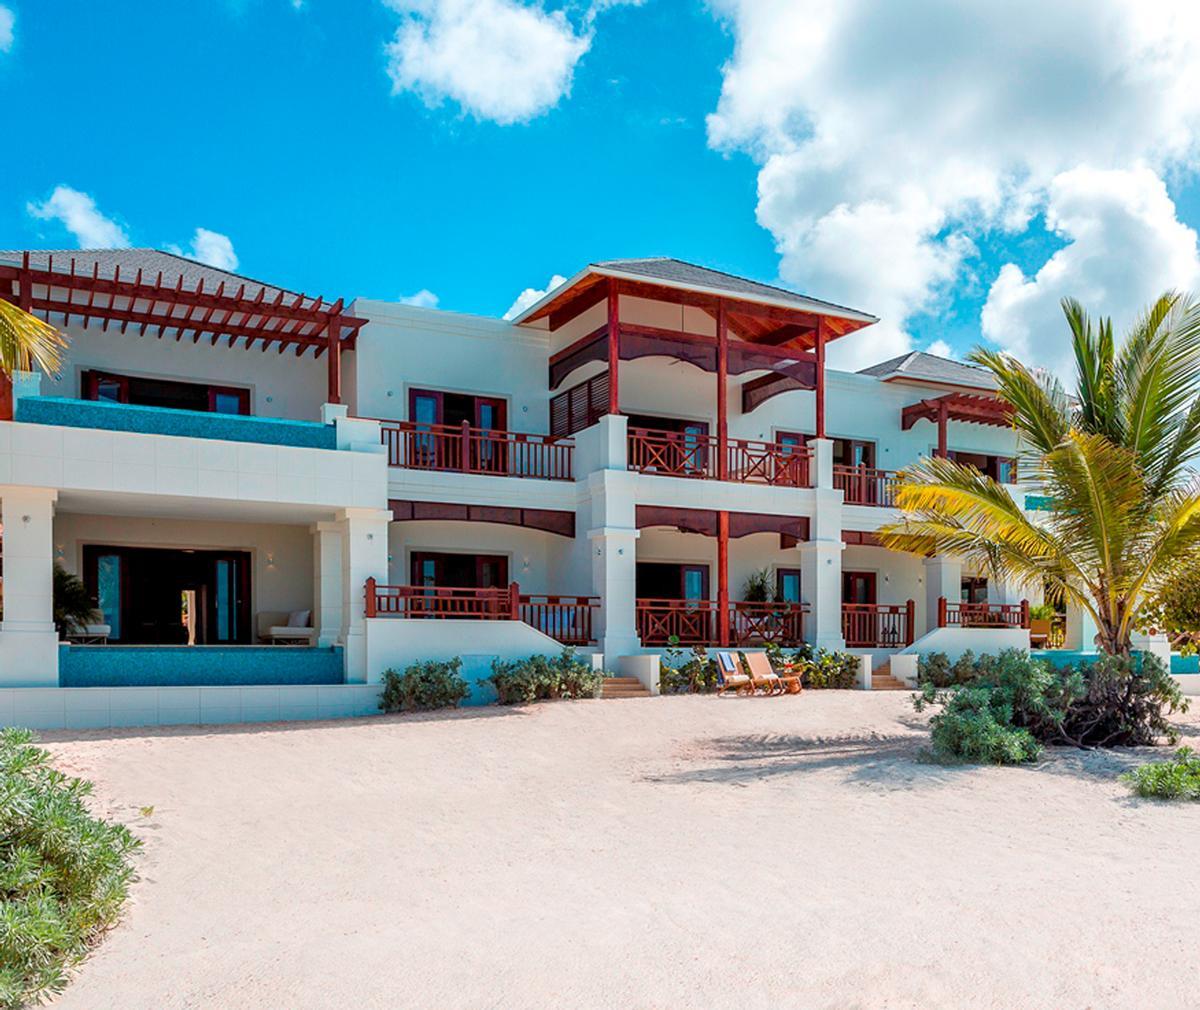 Modern Caribbean Architecture modern, clean lines blend with classic caribbean architecture